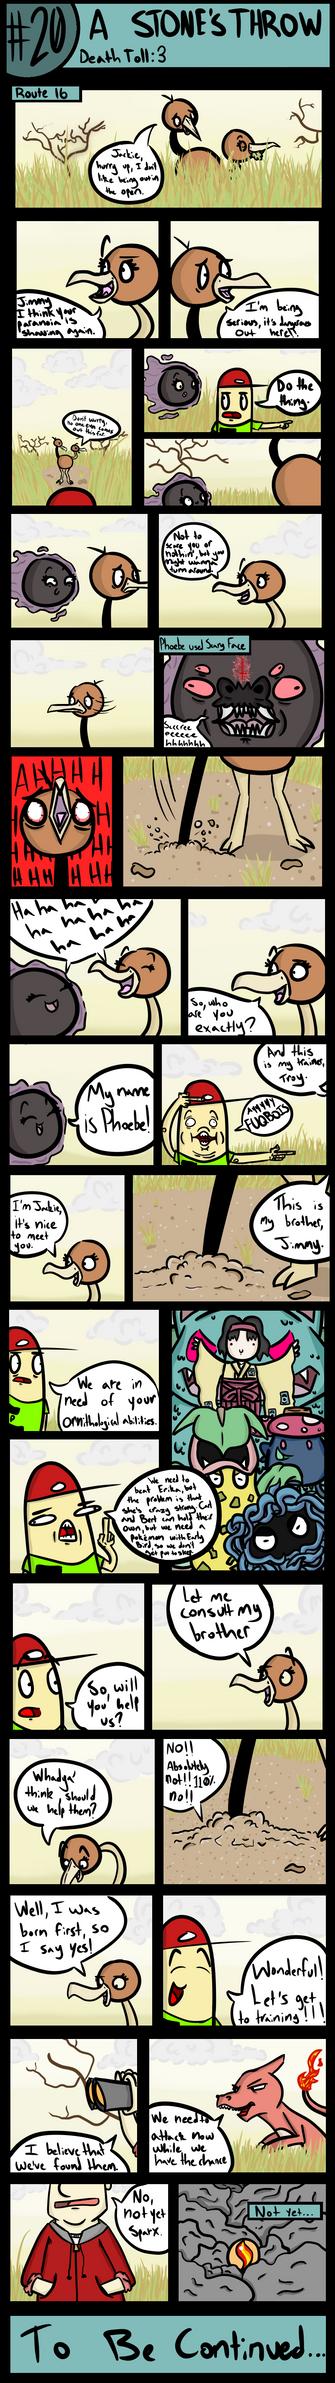 Goomsday: A Gooey Nuzlocke #20: A Stone's Throw by LordGoom